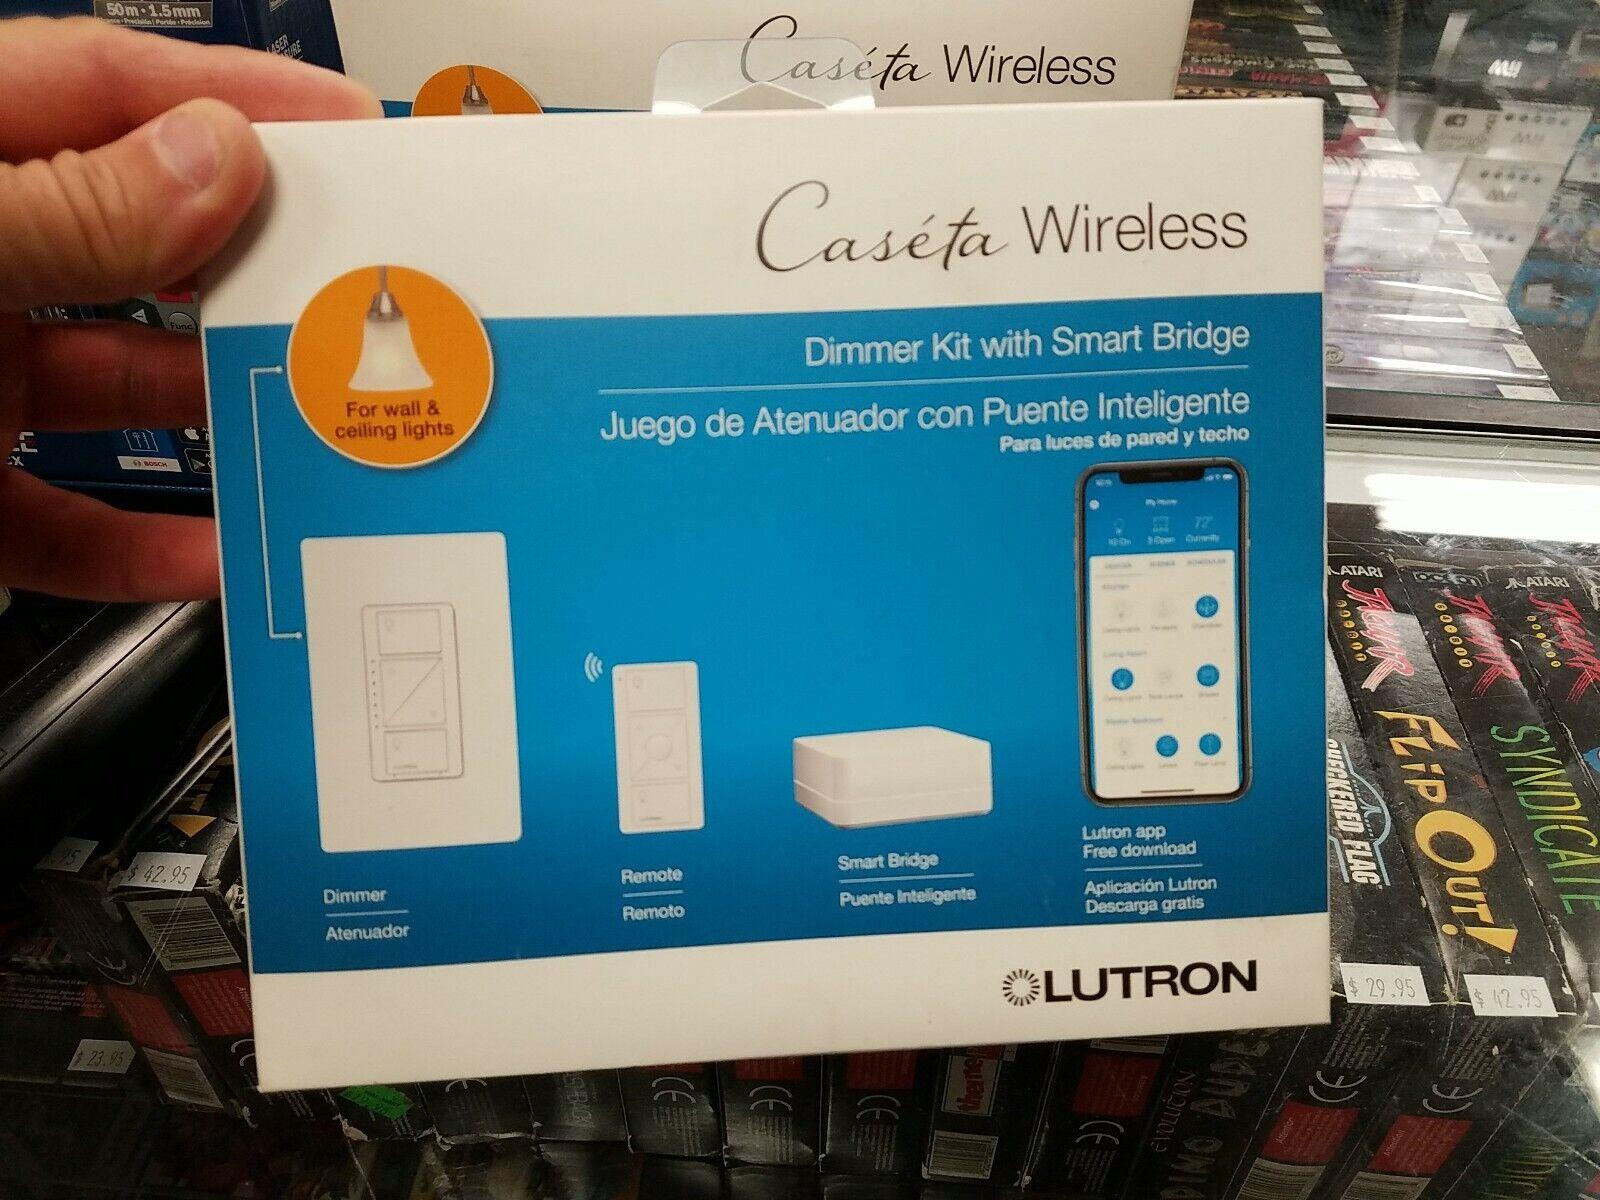 lutron caseta p bdg pkg1w wireless dimmer kit with smart bridge white